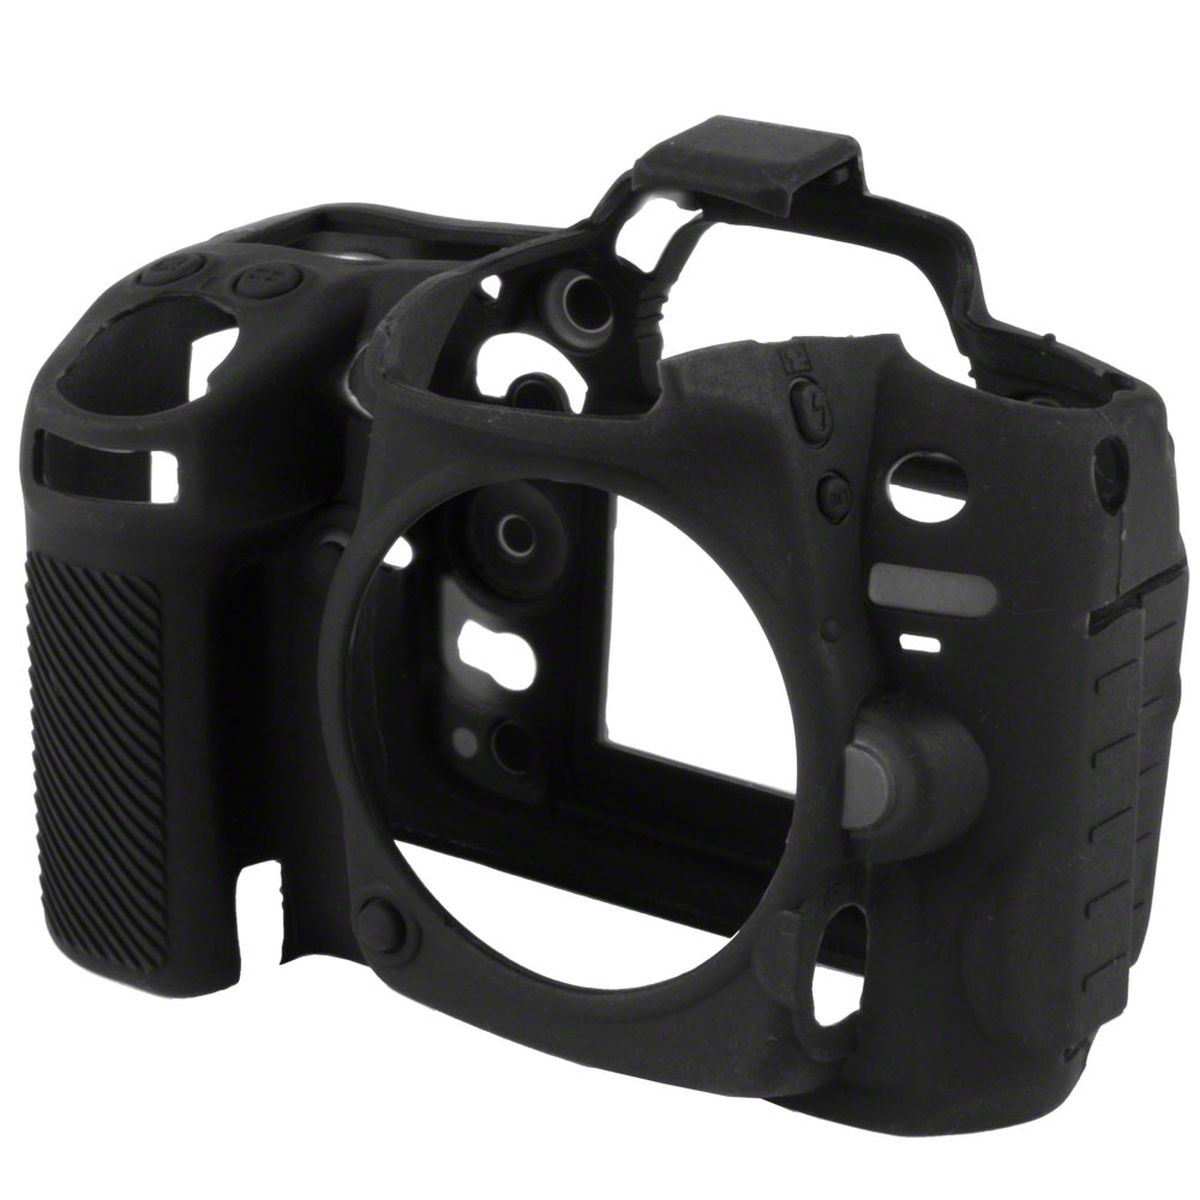 easyCover Silikon Schutzhülle für Nikon D7000